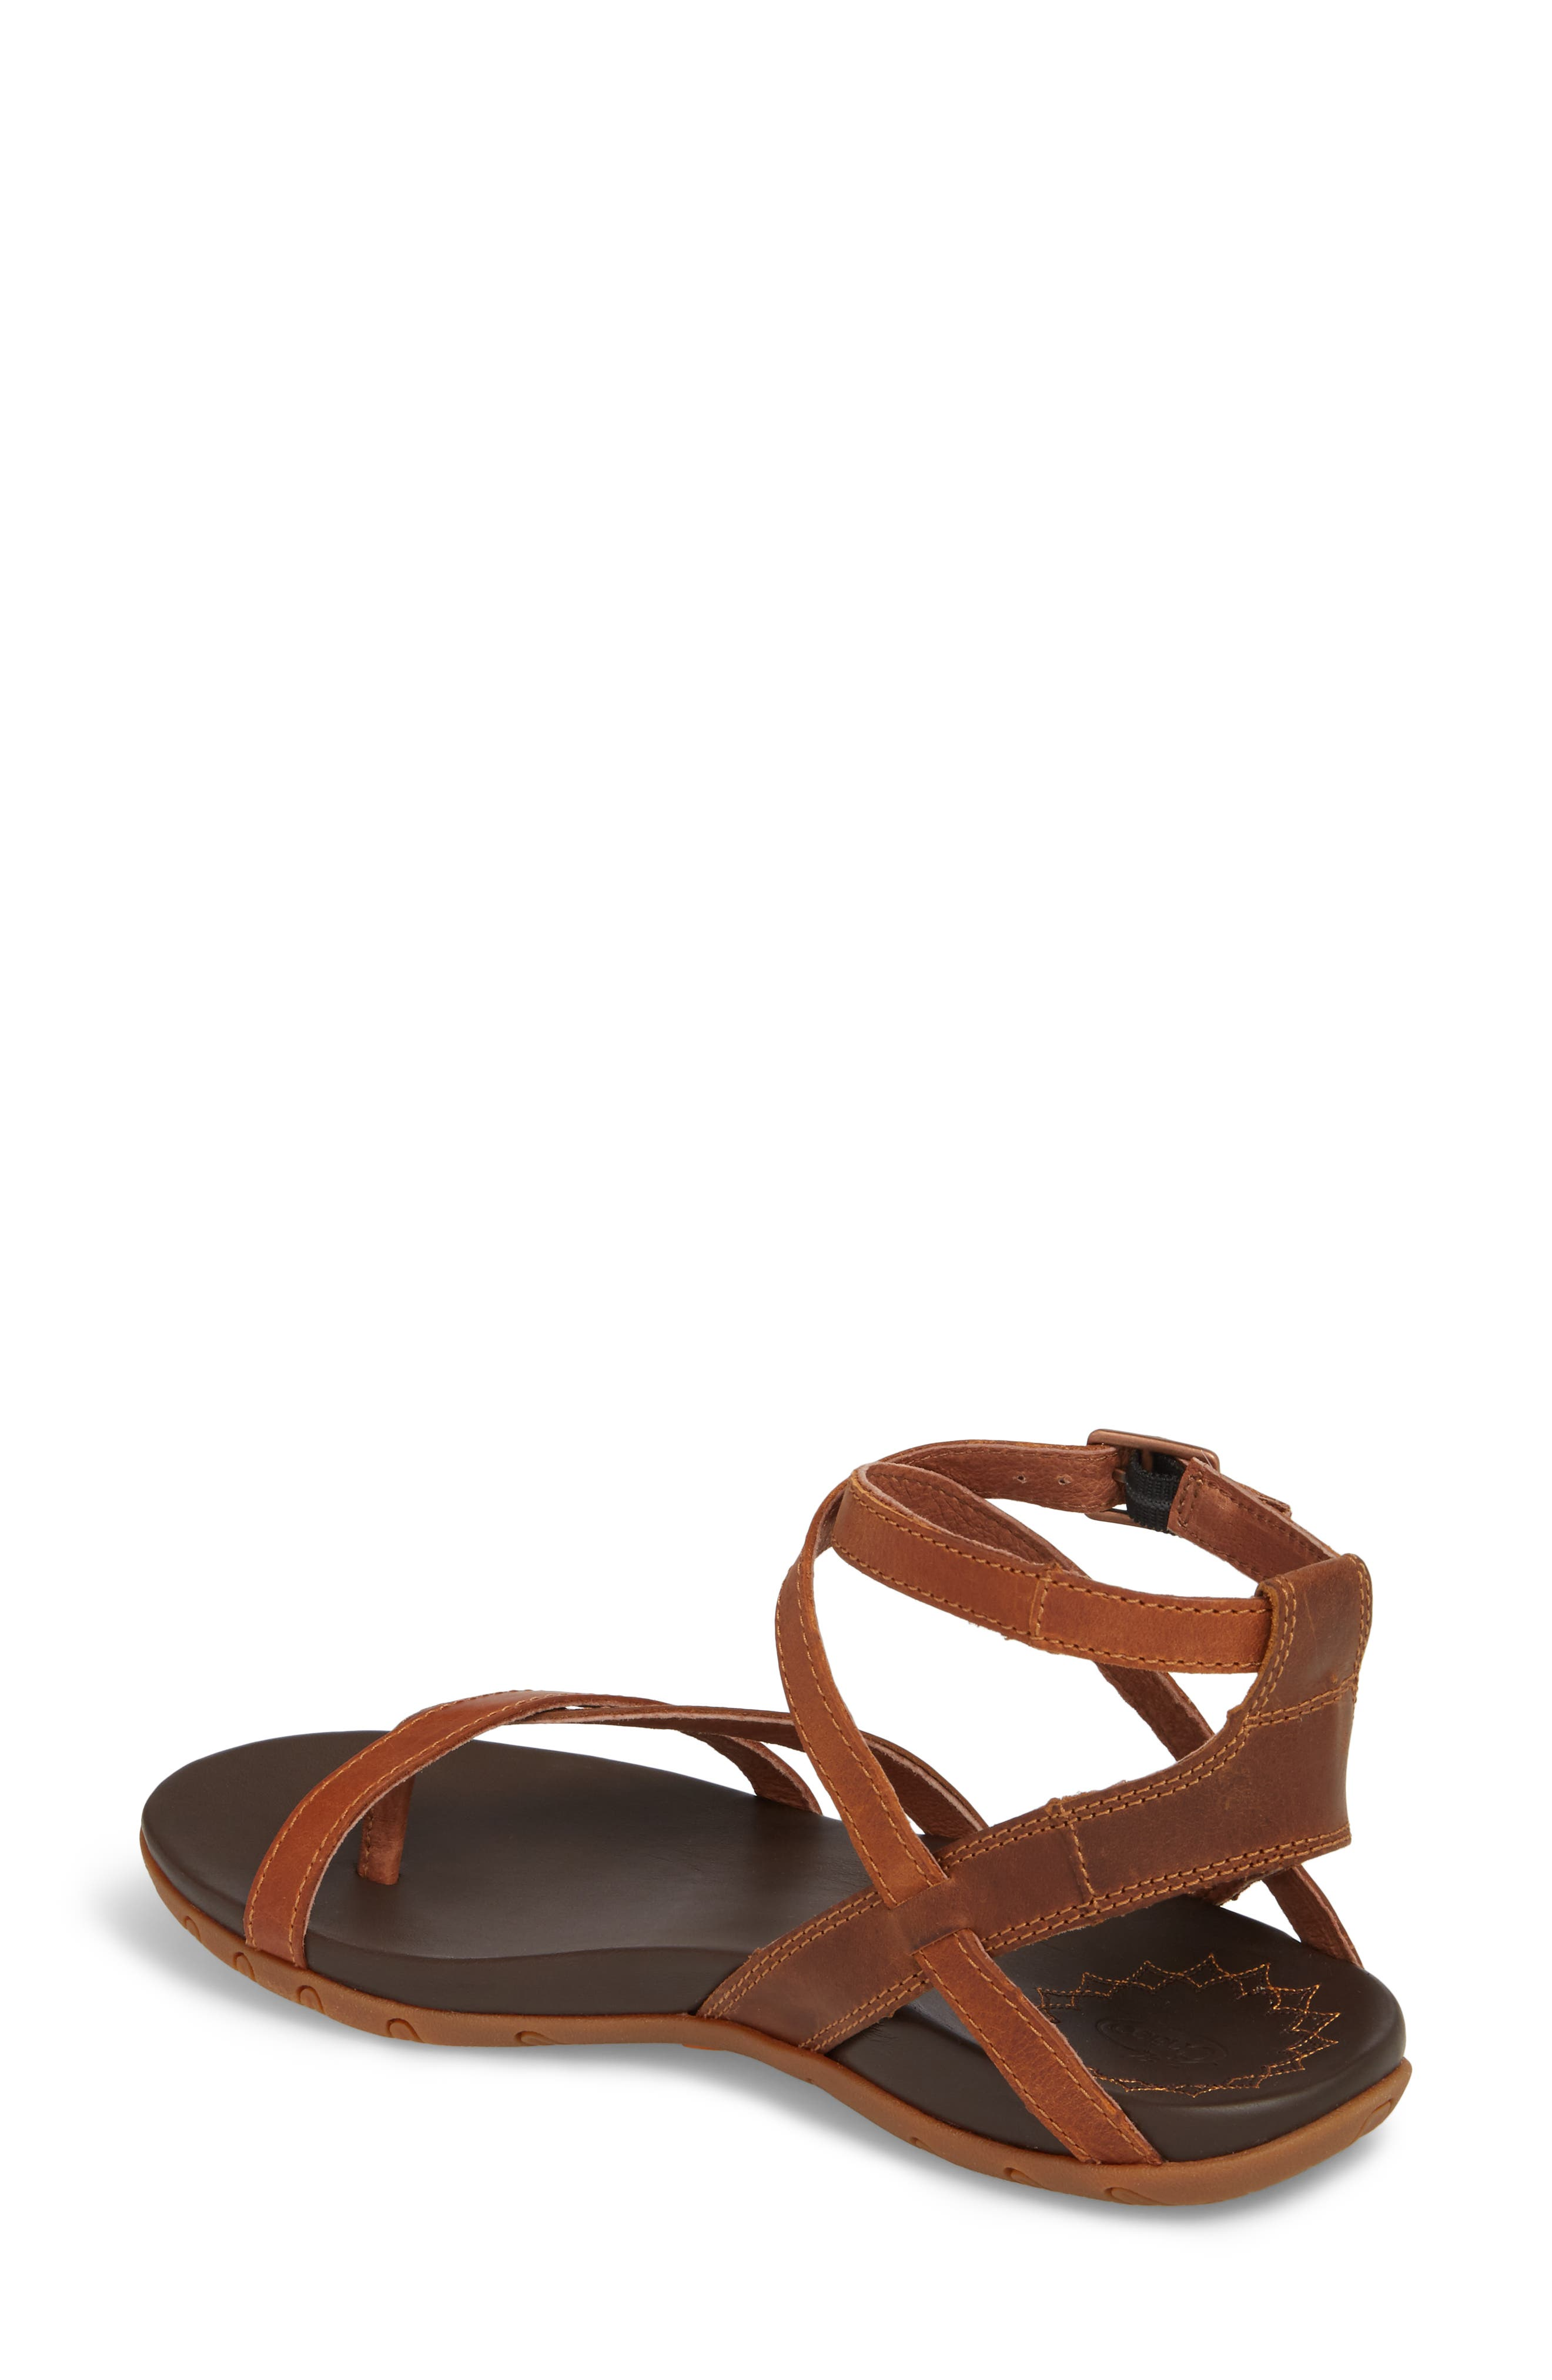 Juniper Sandal,                             Alternate thumbnail 2, color,                             Rust Leather